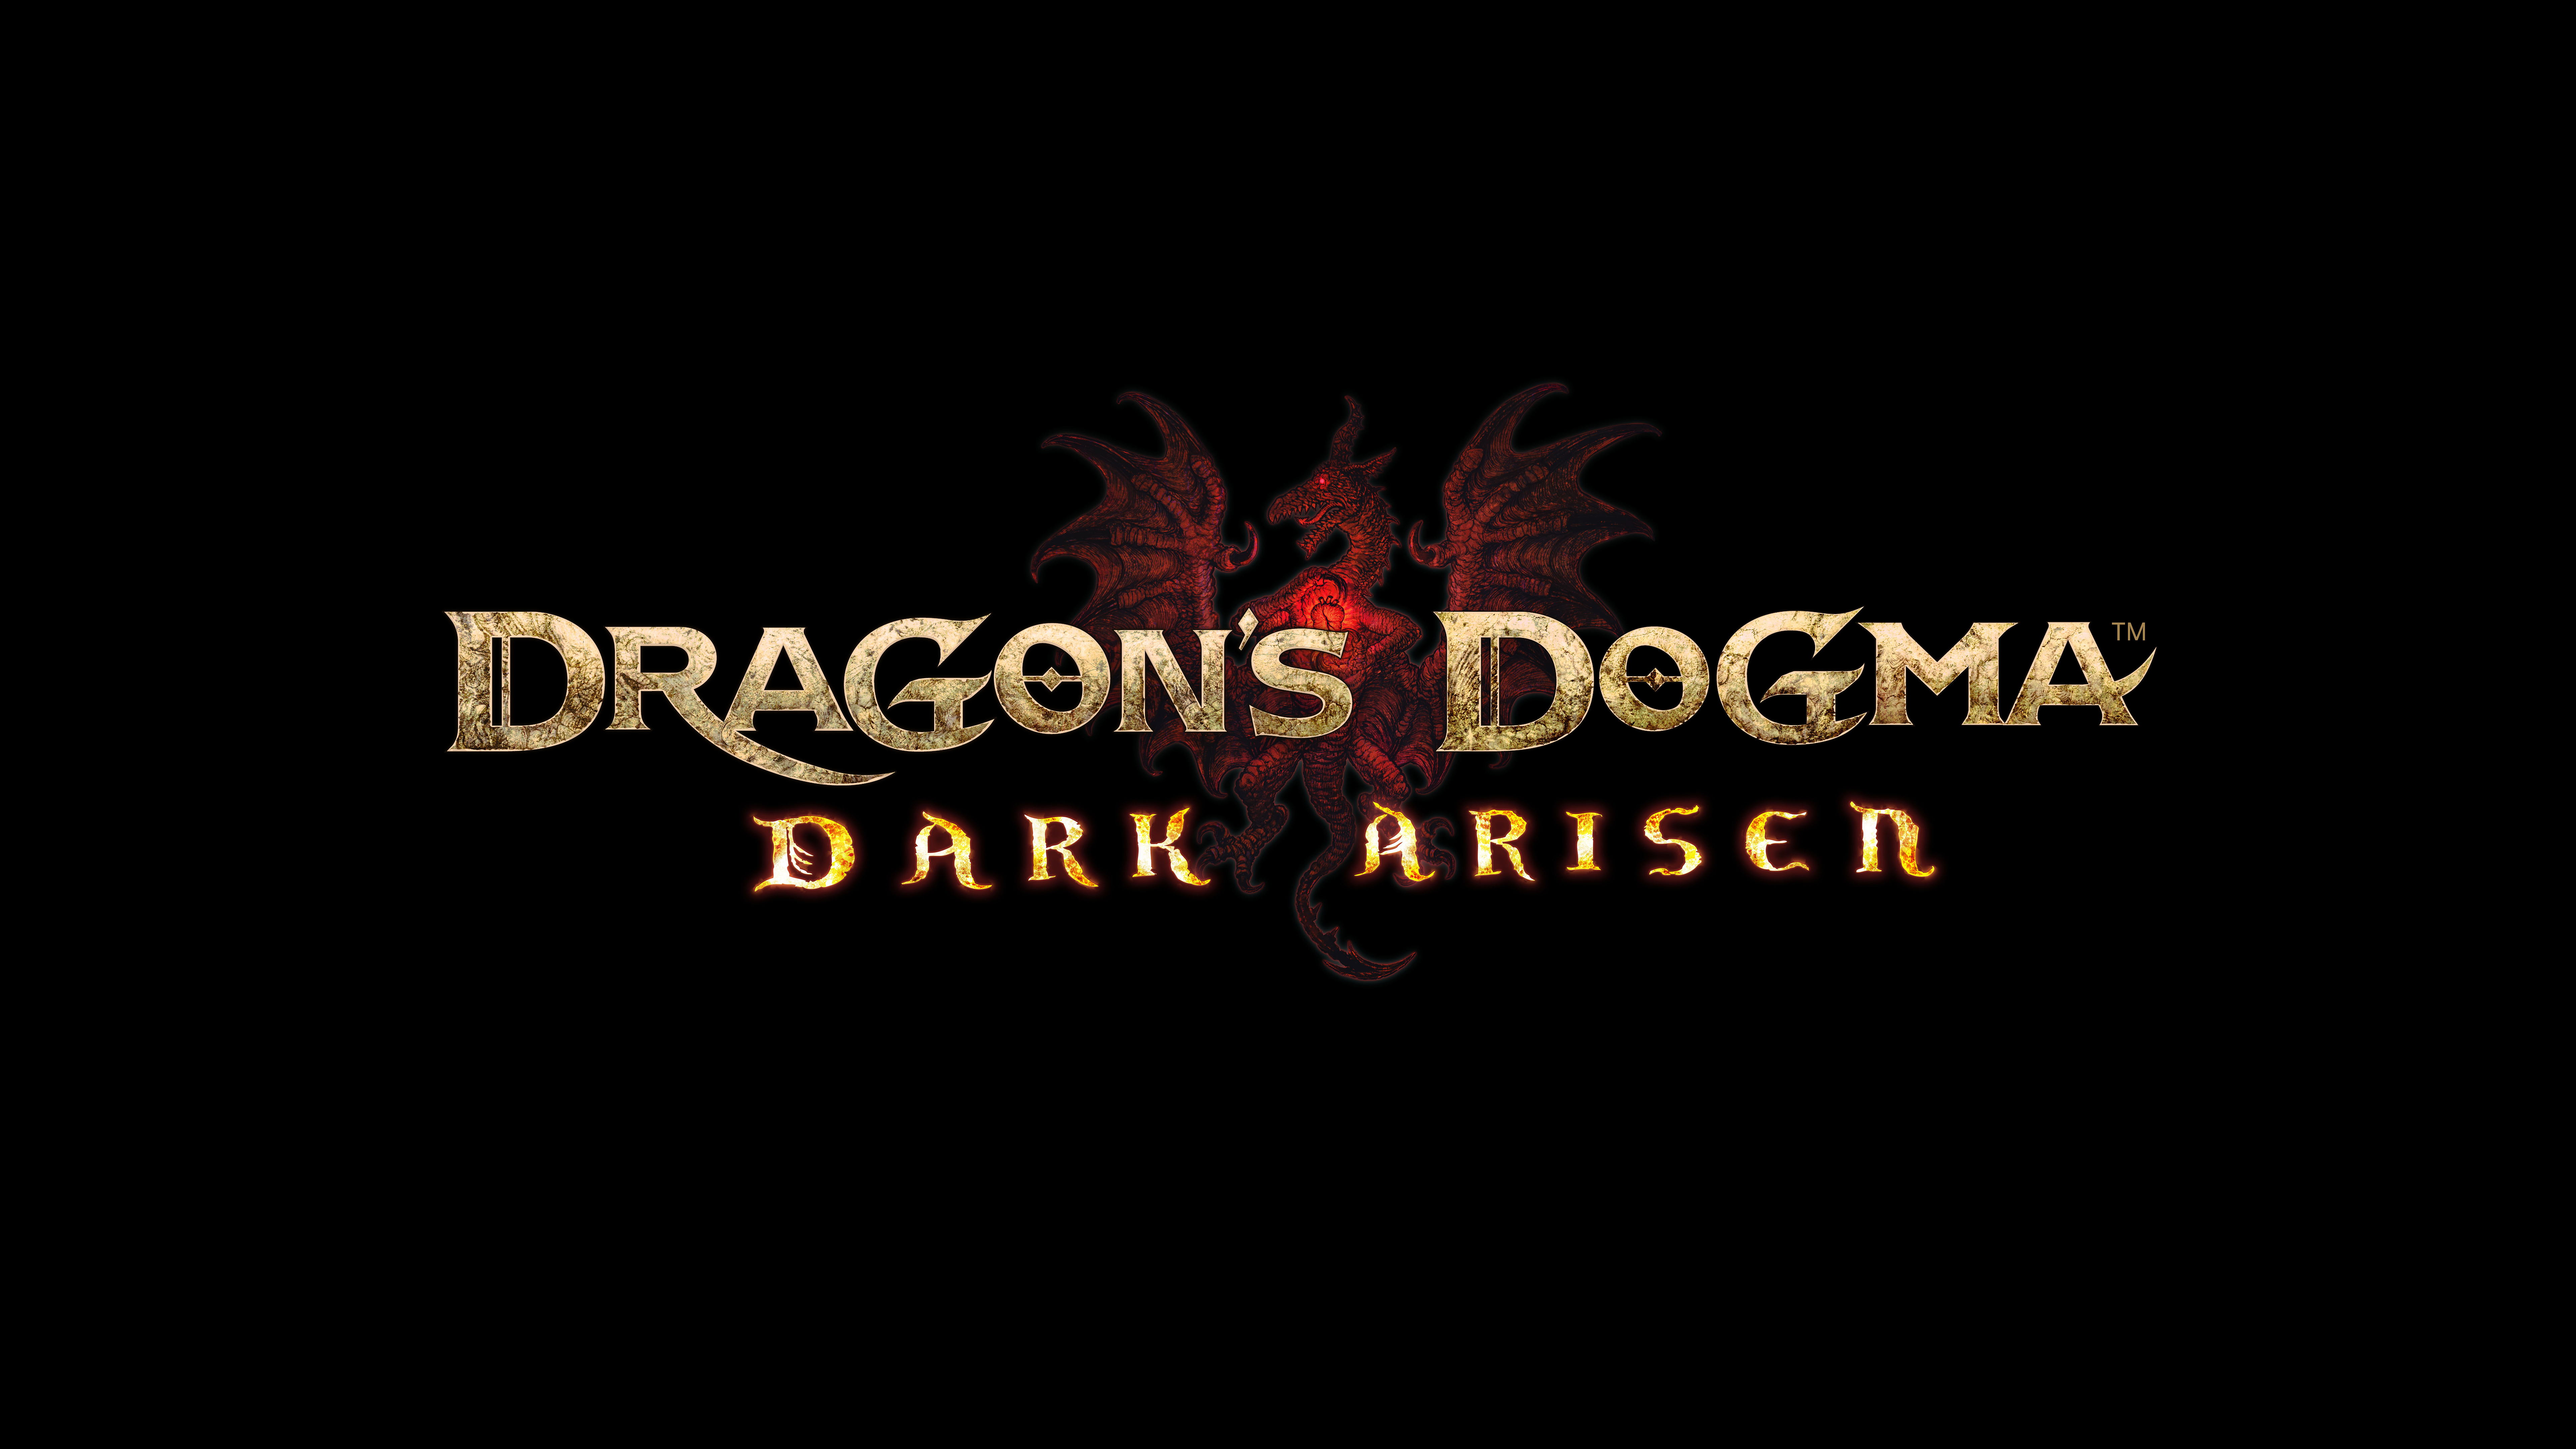 Fondos de pantalla Dragon's Dogma: Dark Arisen